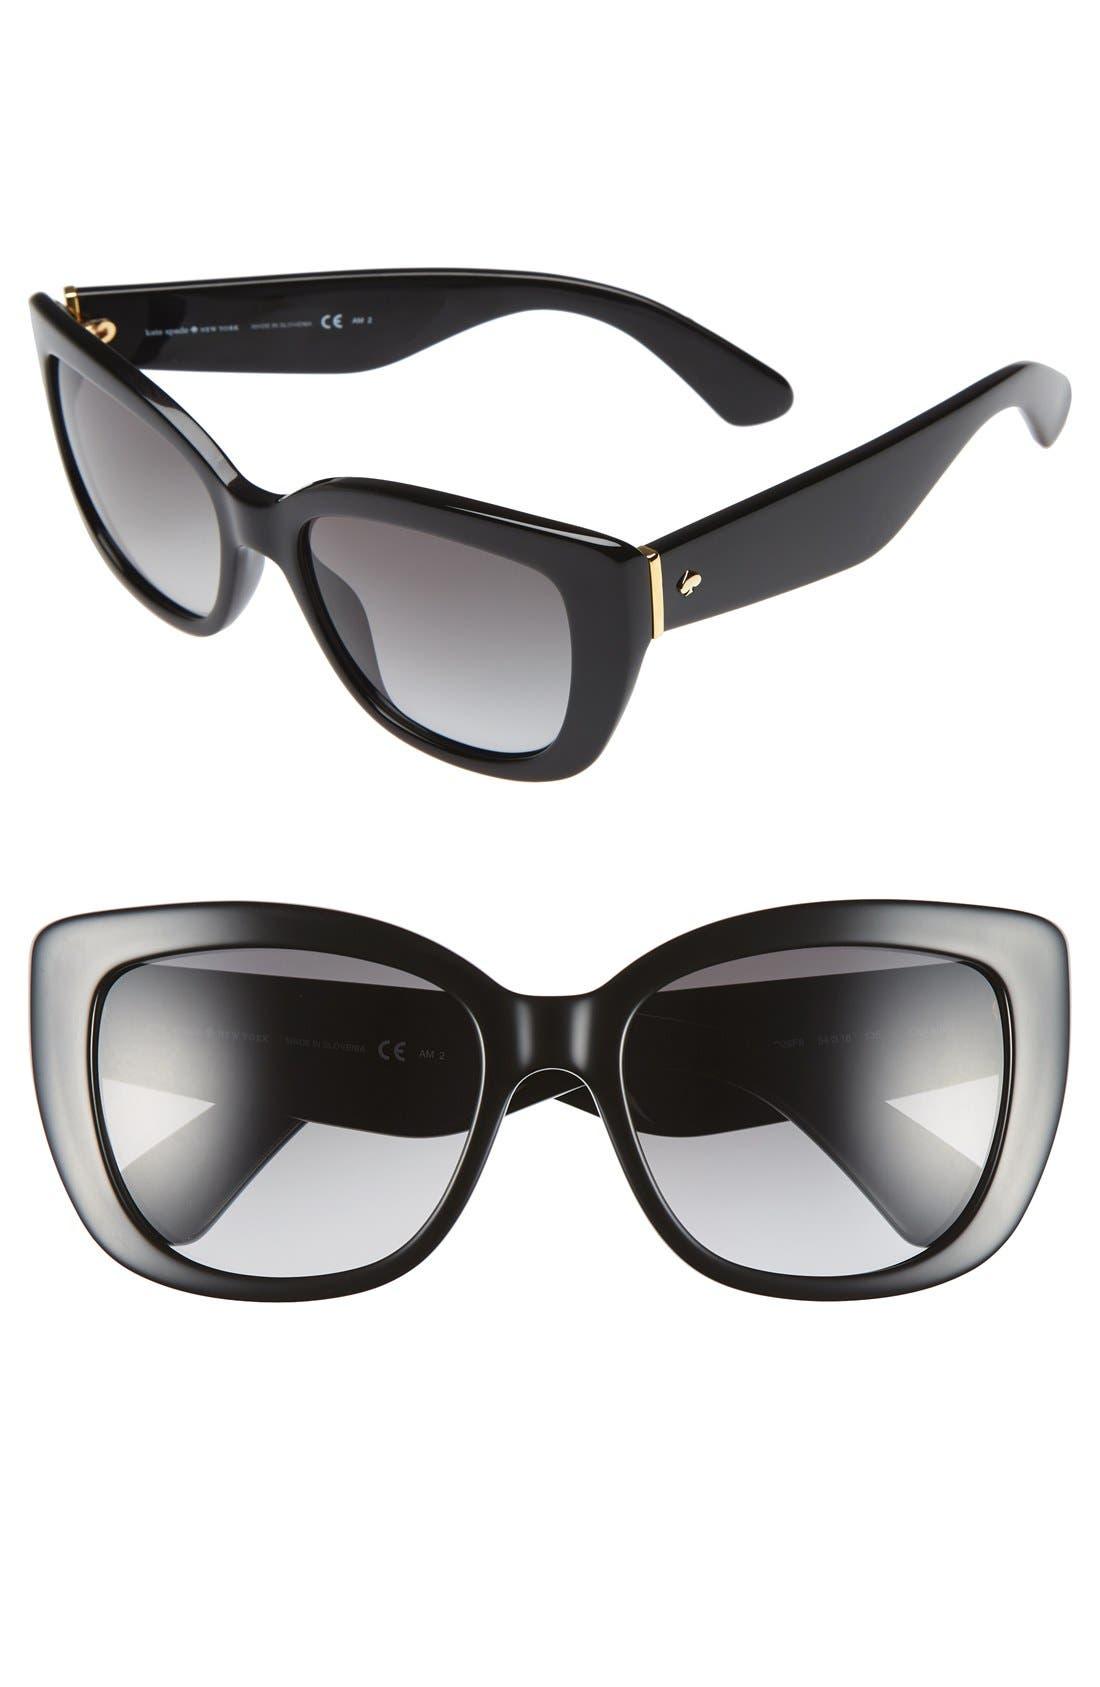 Main Image - kate spade new york 'andris' 54mm sunglasses